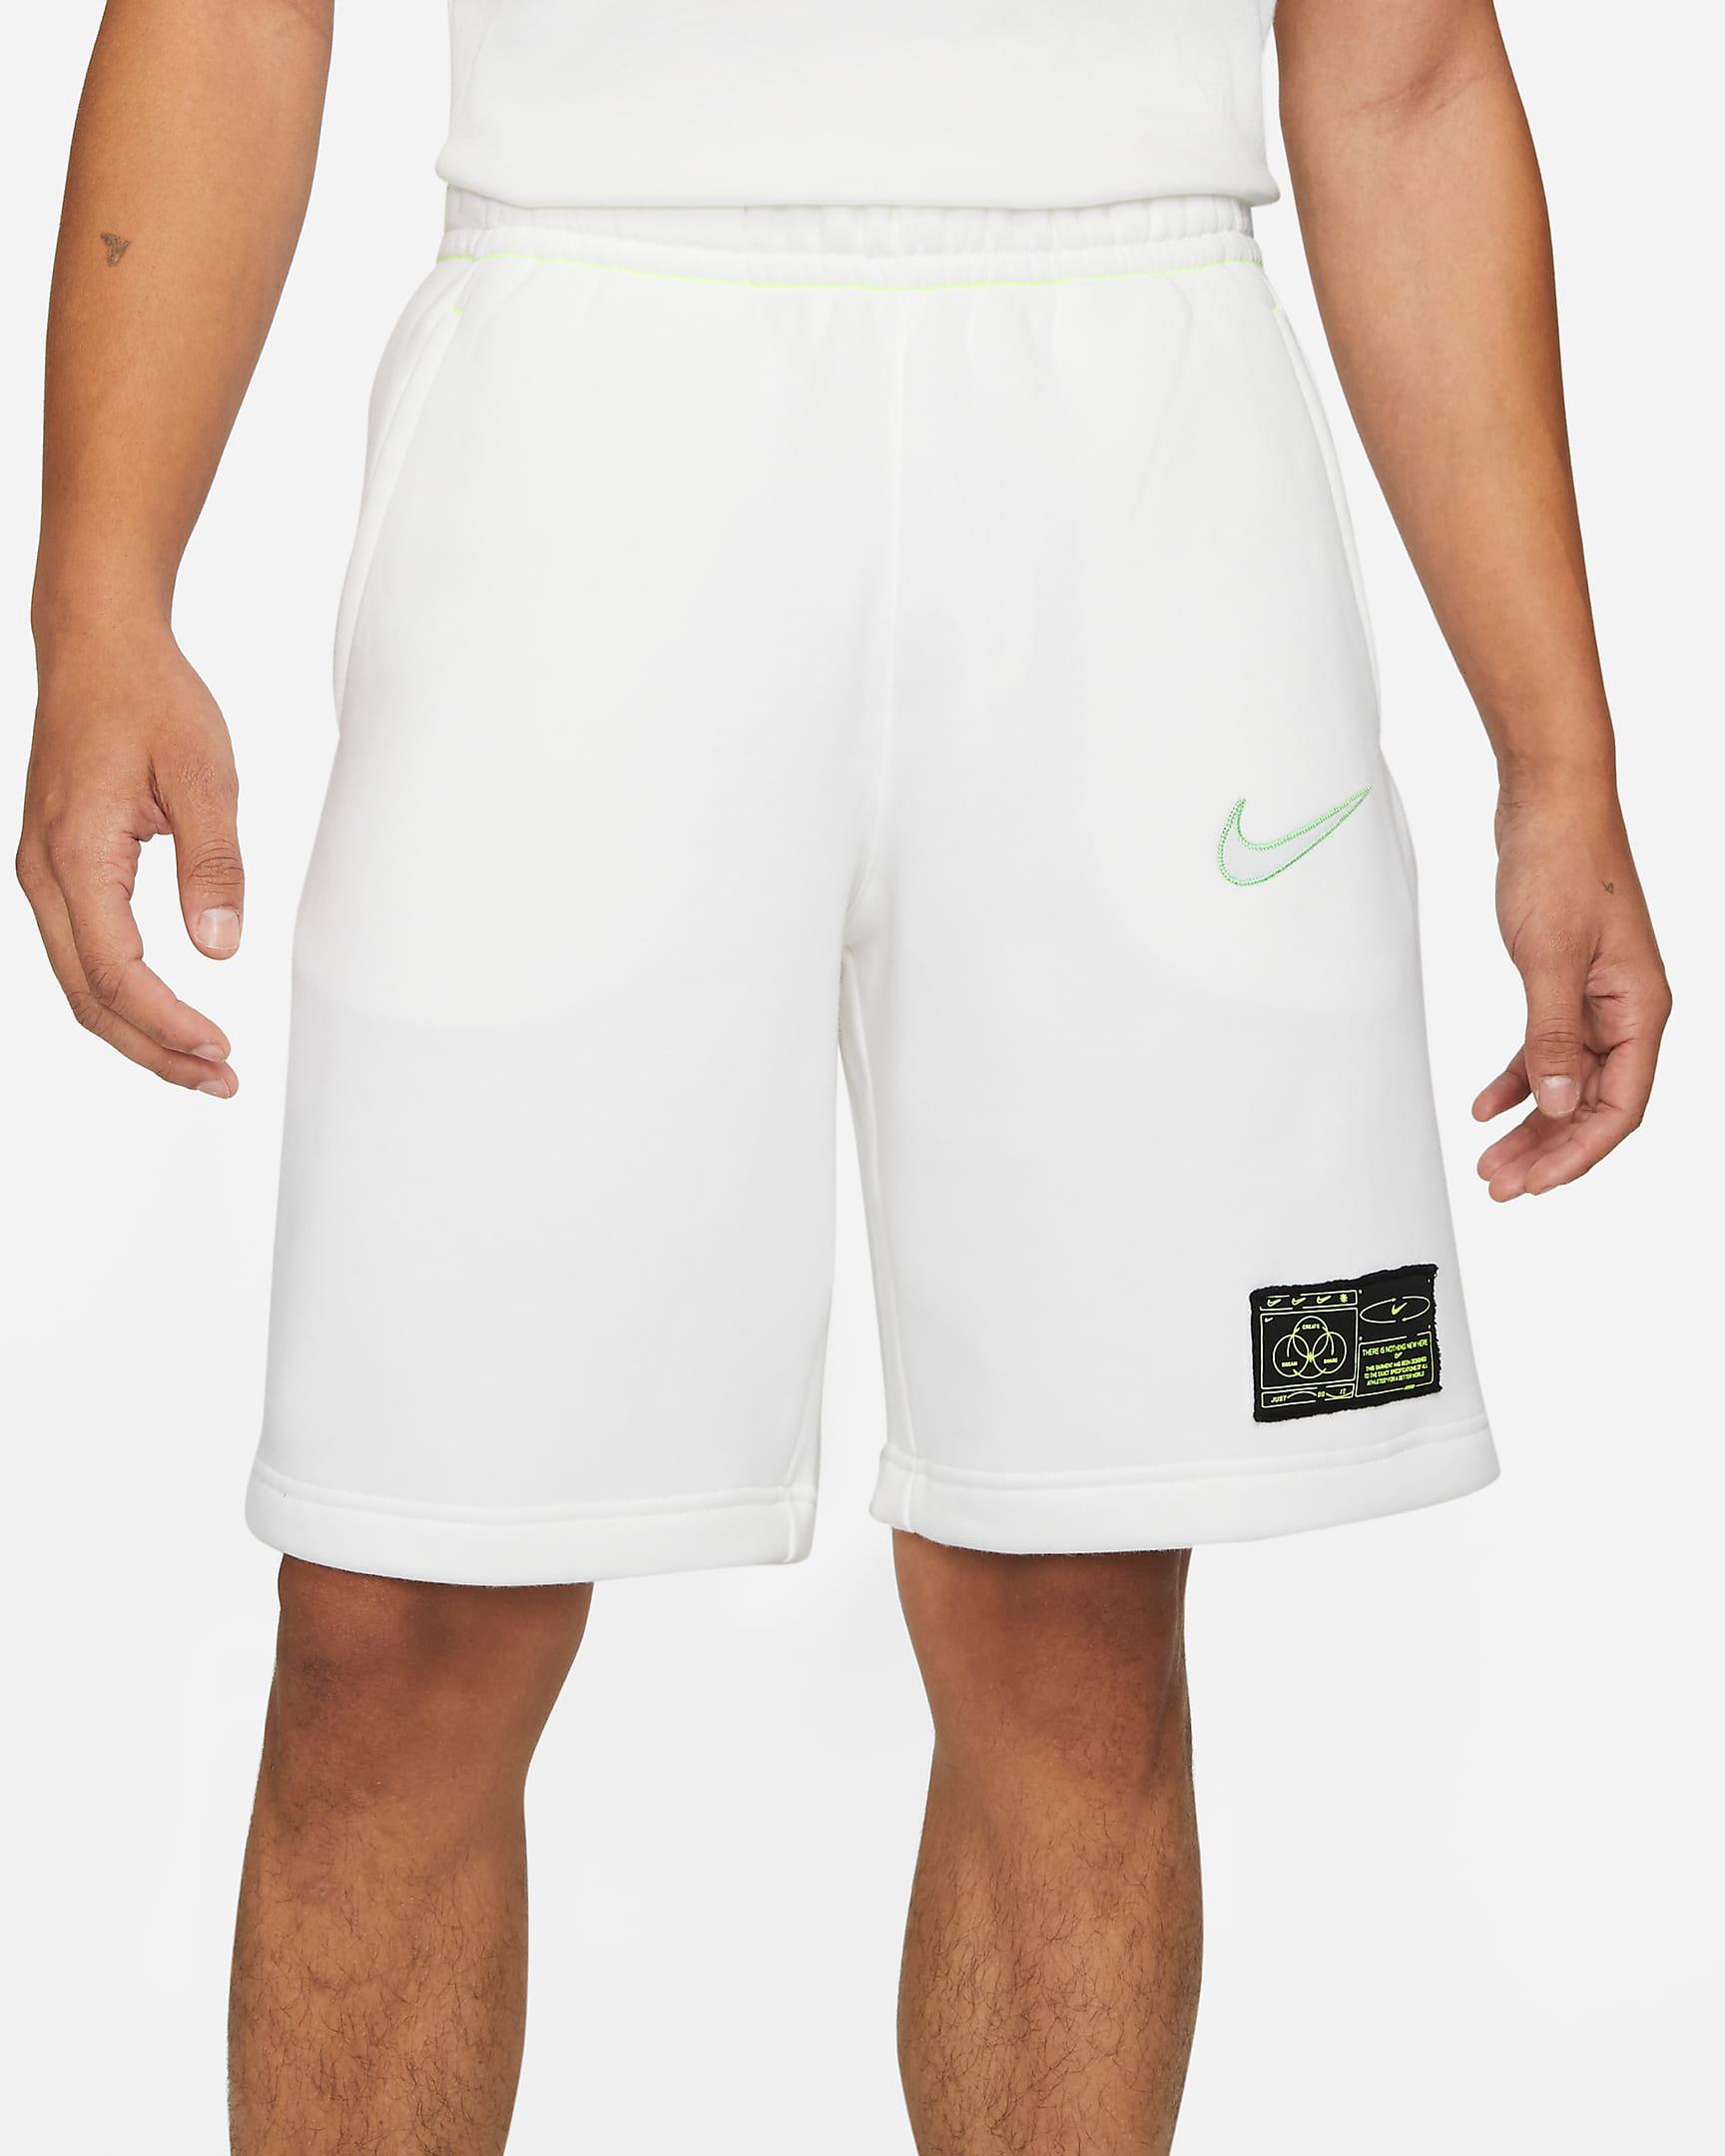 nike-club-fleece-shorts-white-volt-2